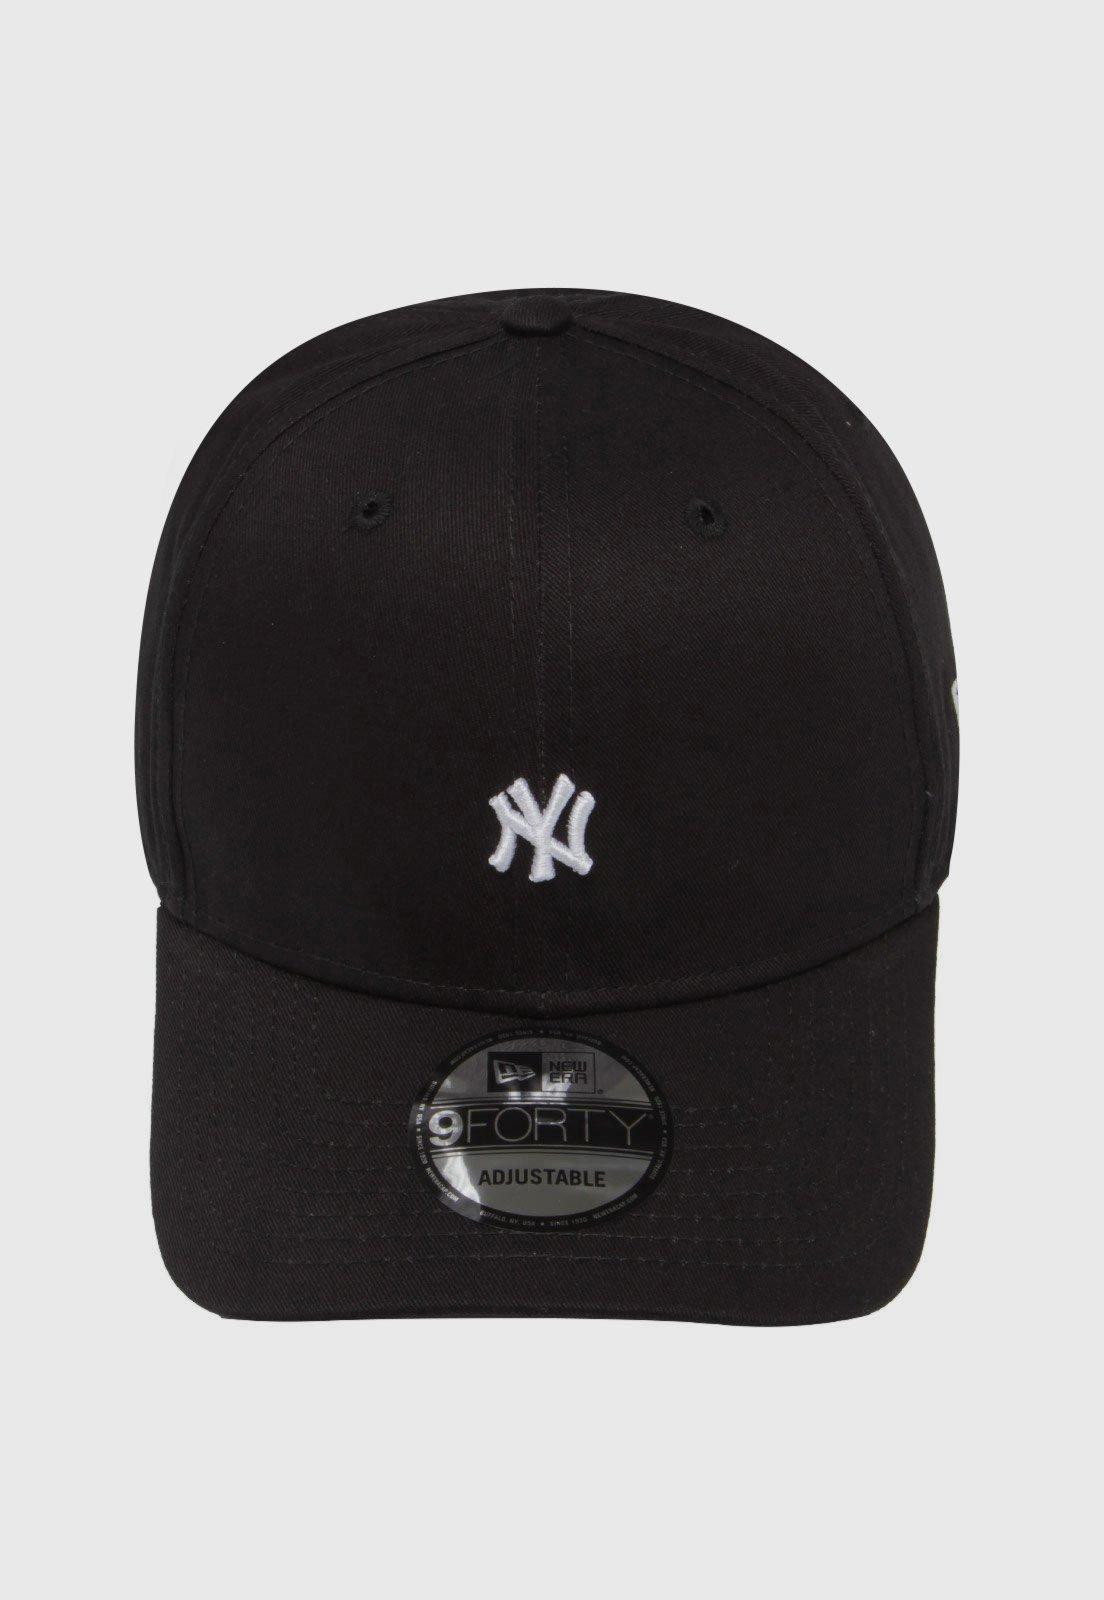 Boné New Era Snapback 940 SN Minilogo New York Yankees Preto - Compre Agora   5c65c4dfc5a